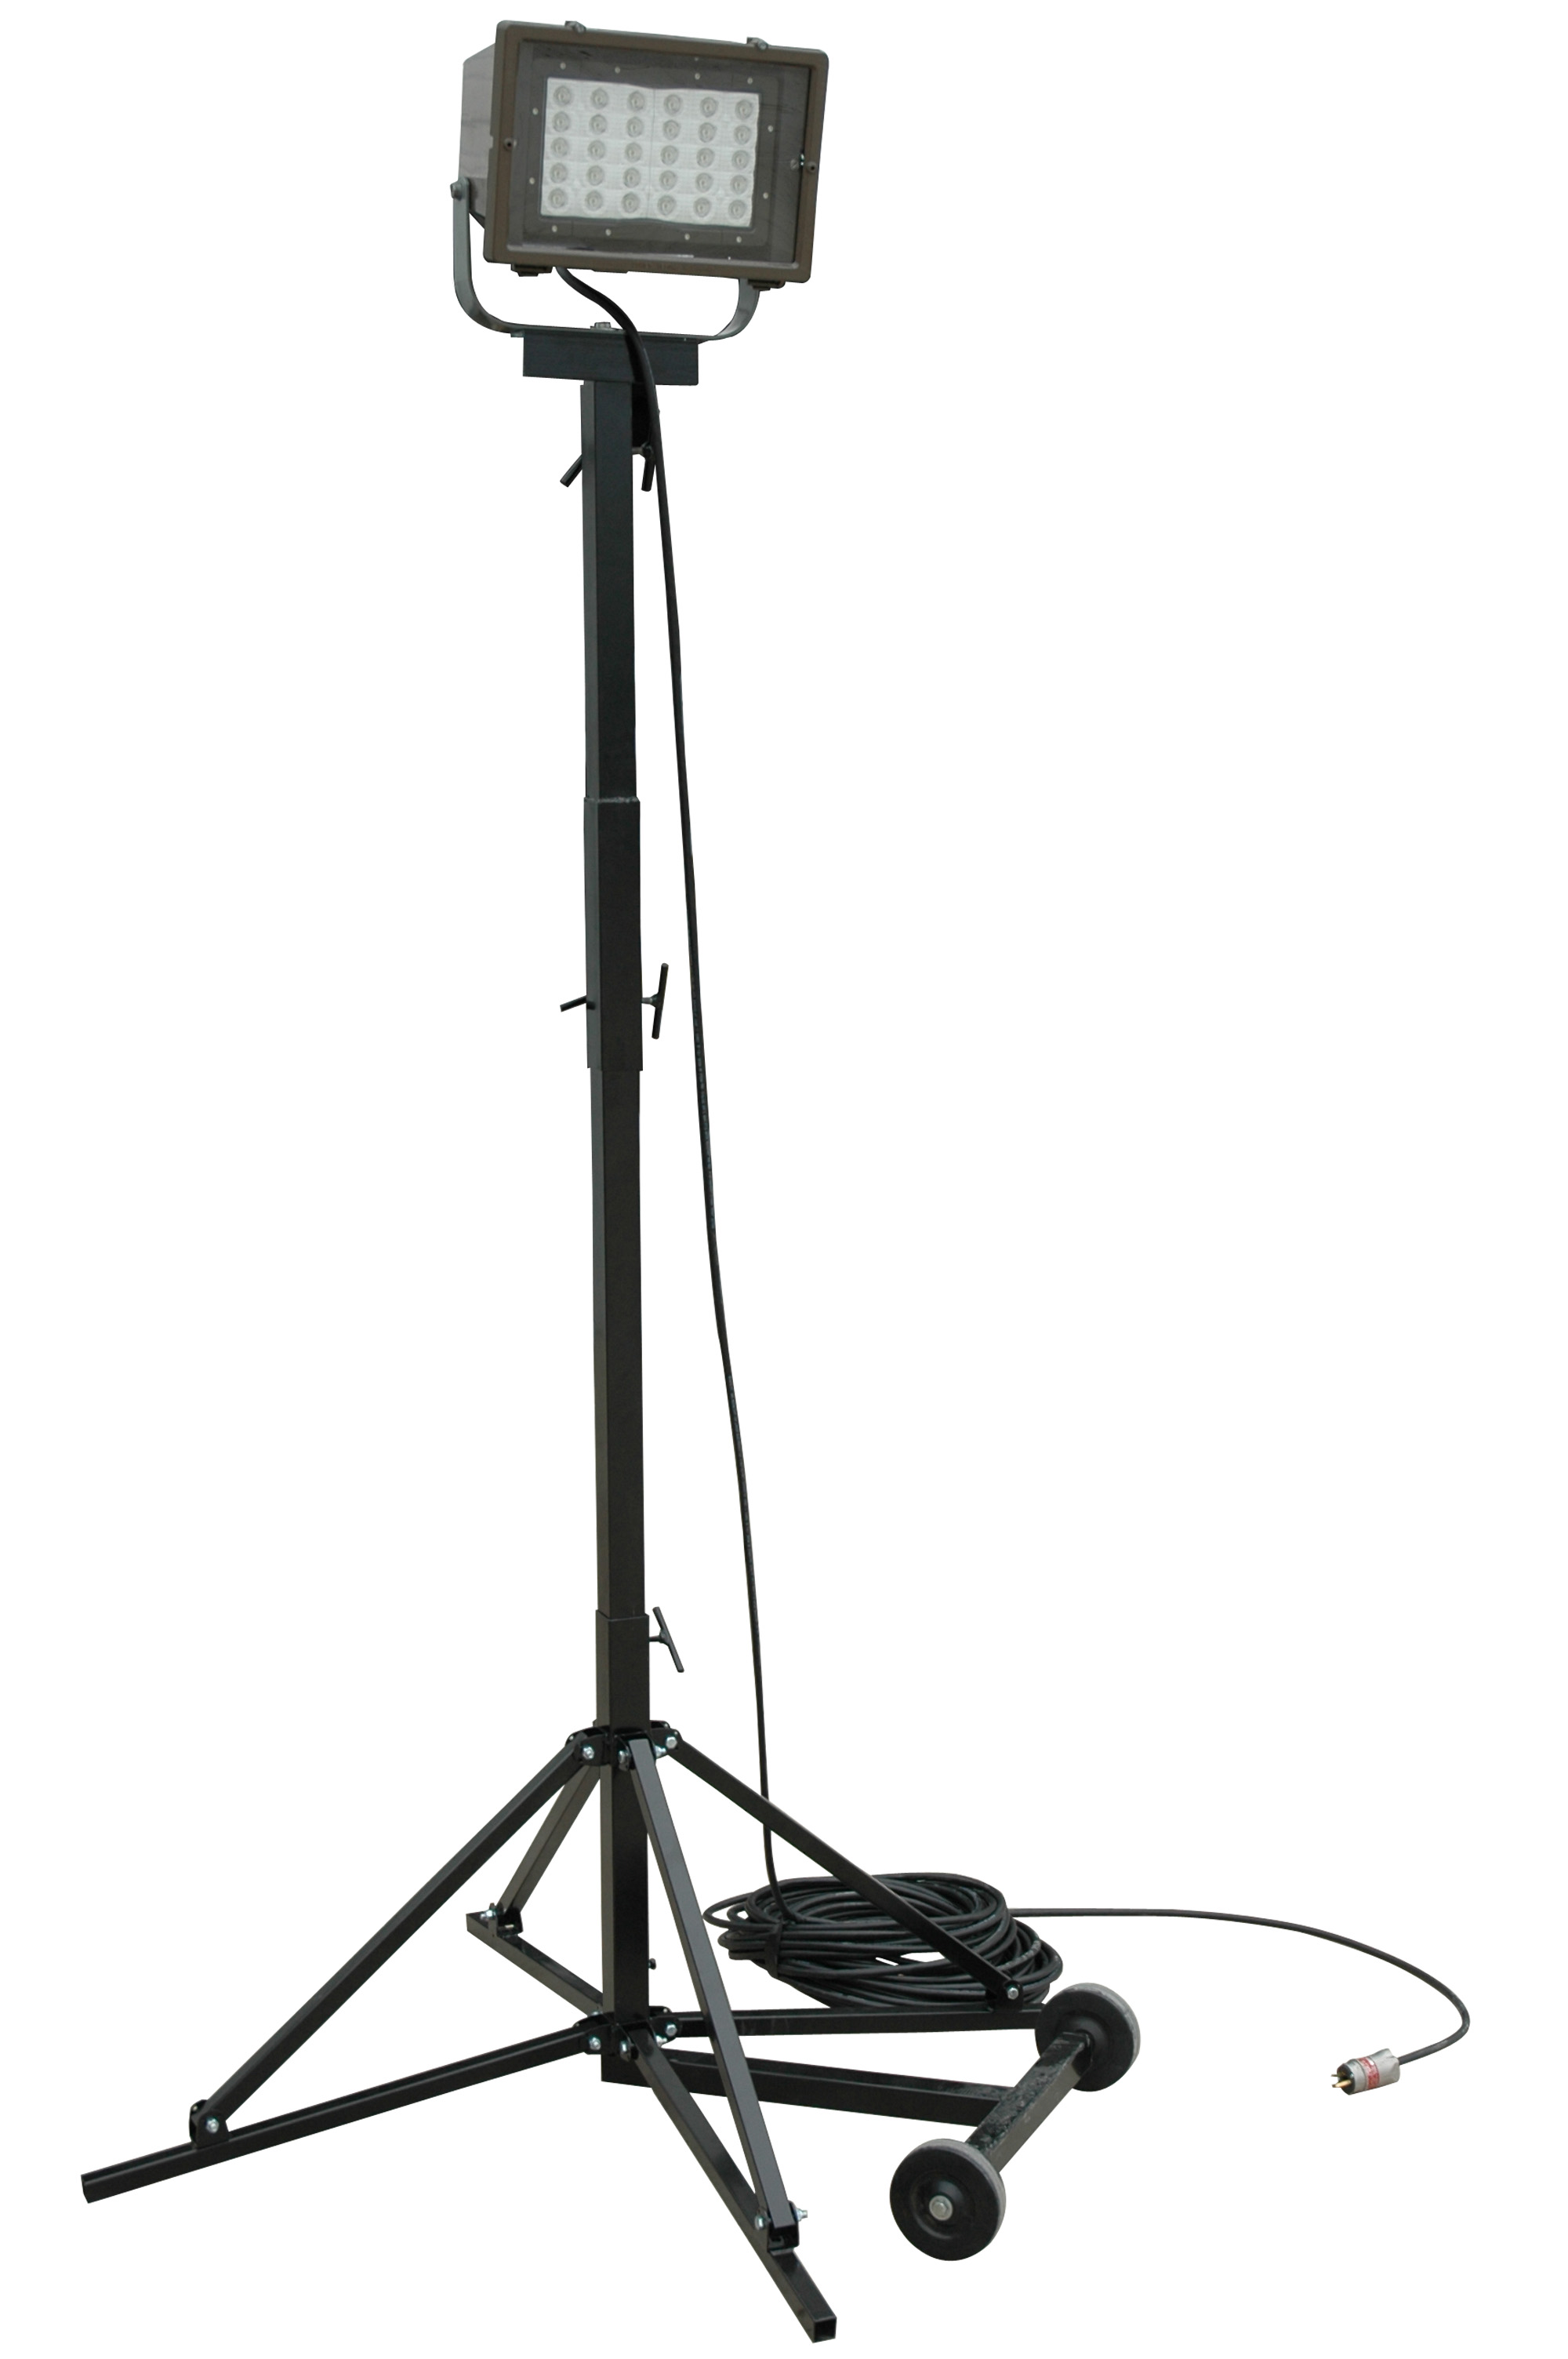 Larson Electronics Releases Adjustable Led Light Tower